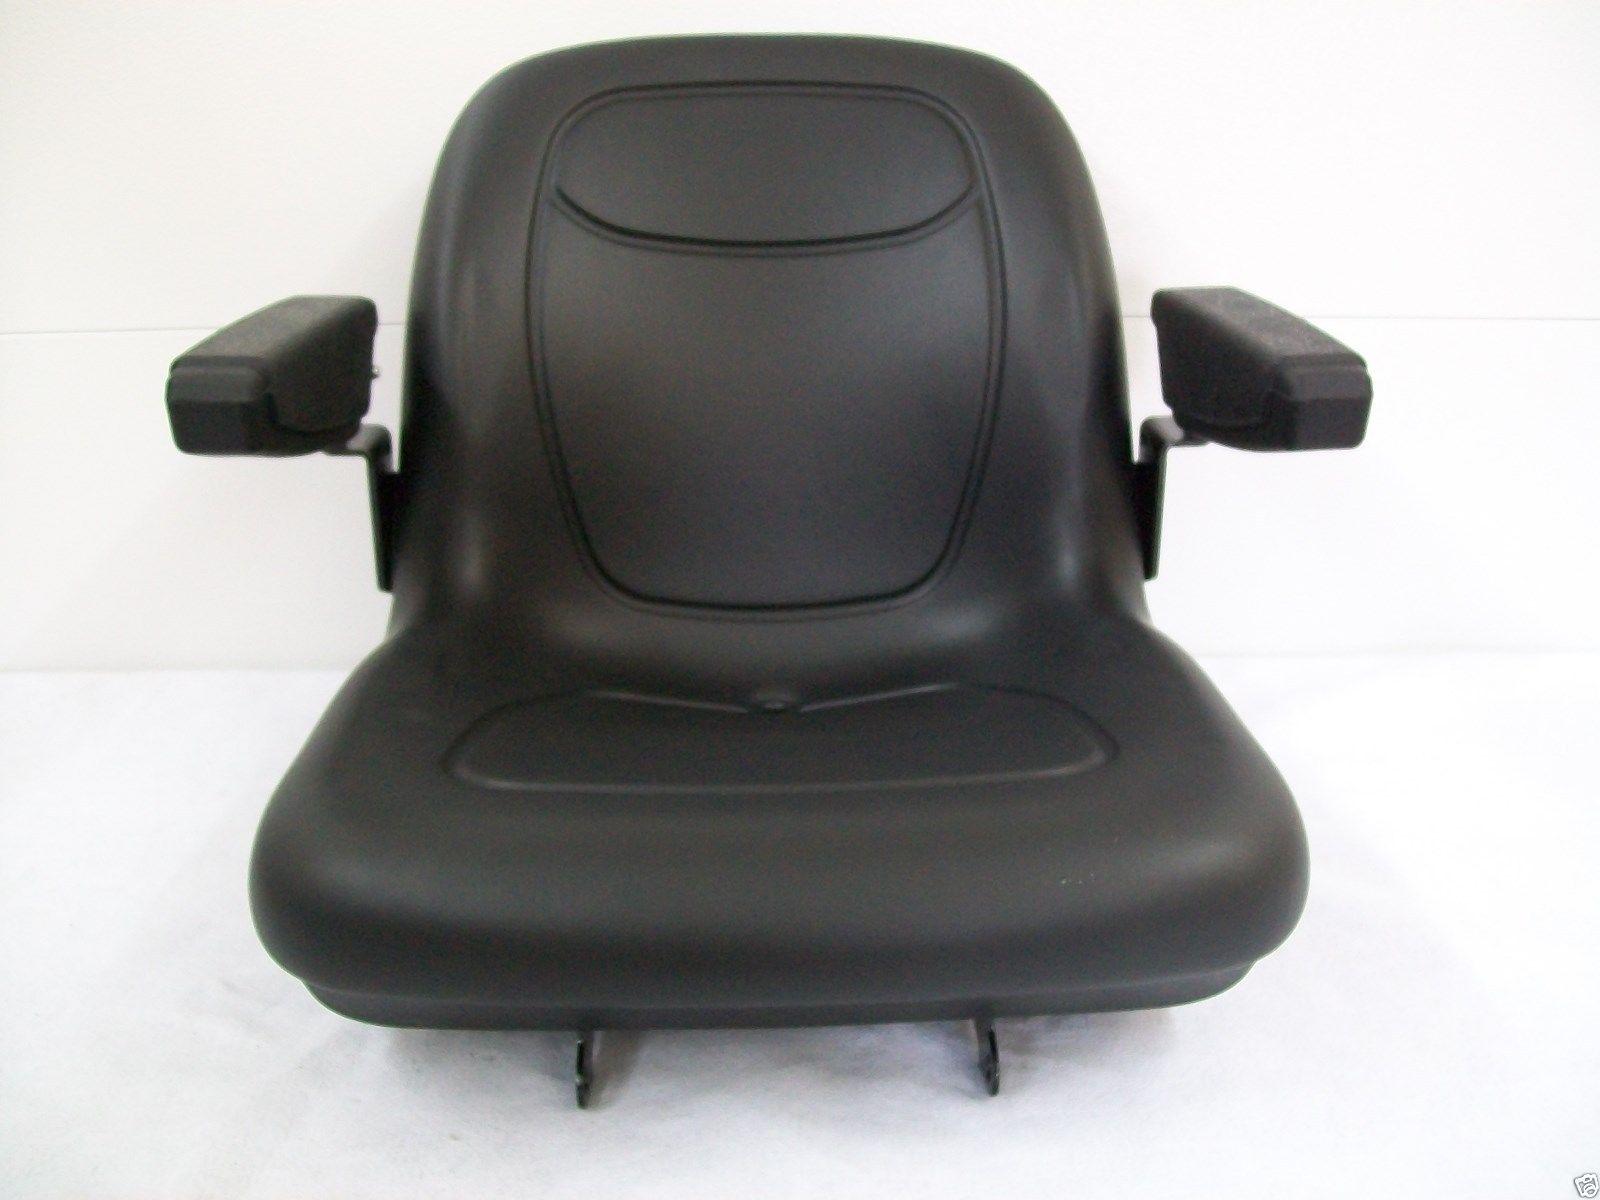 BLACK SEAT JOHN DEERE COMPACT TRACTORS 670, 770, 790, 870, 970, 990,1070,  3005 #JL   Seat Warehouse